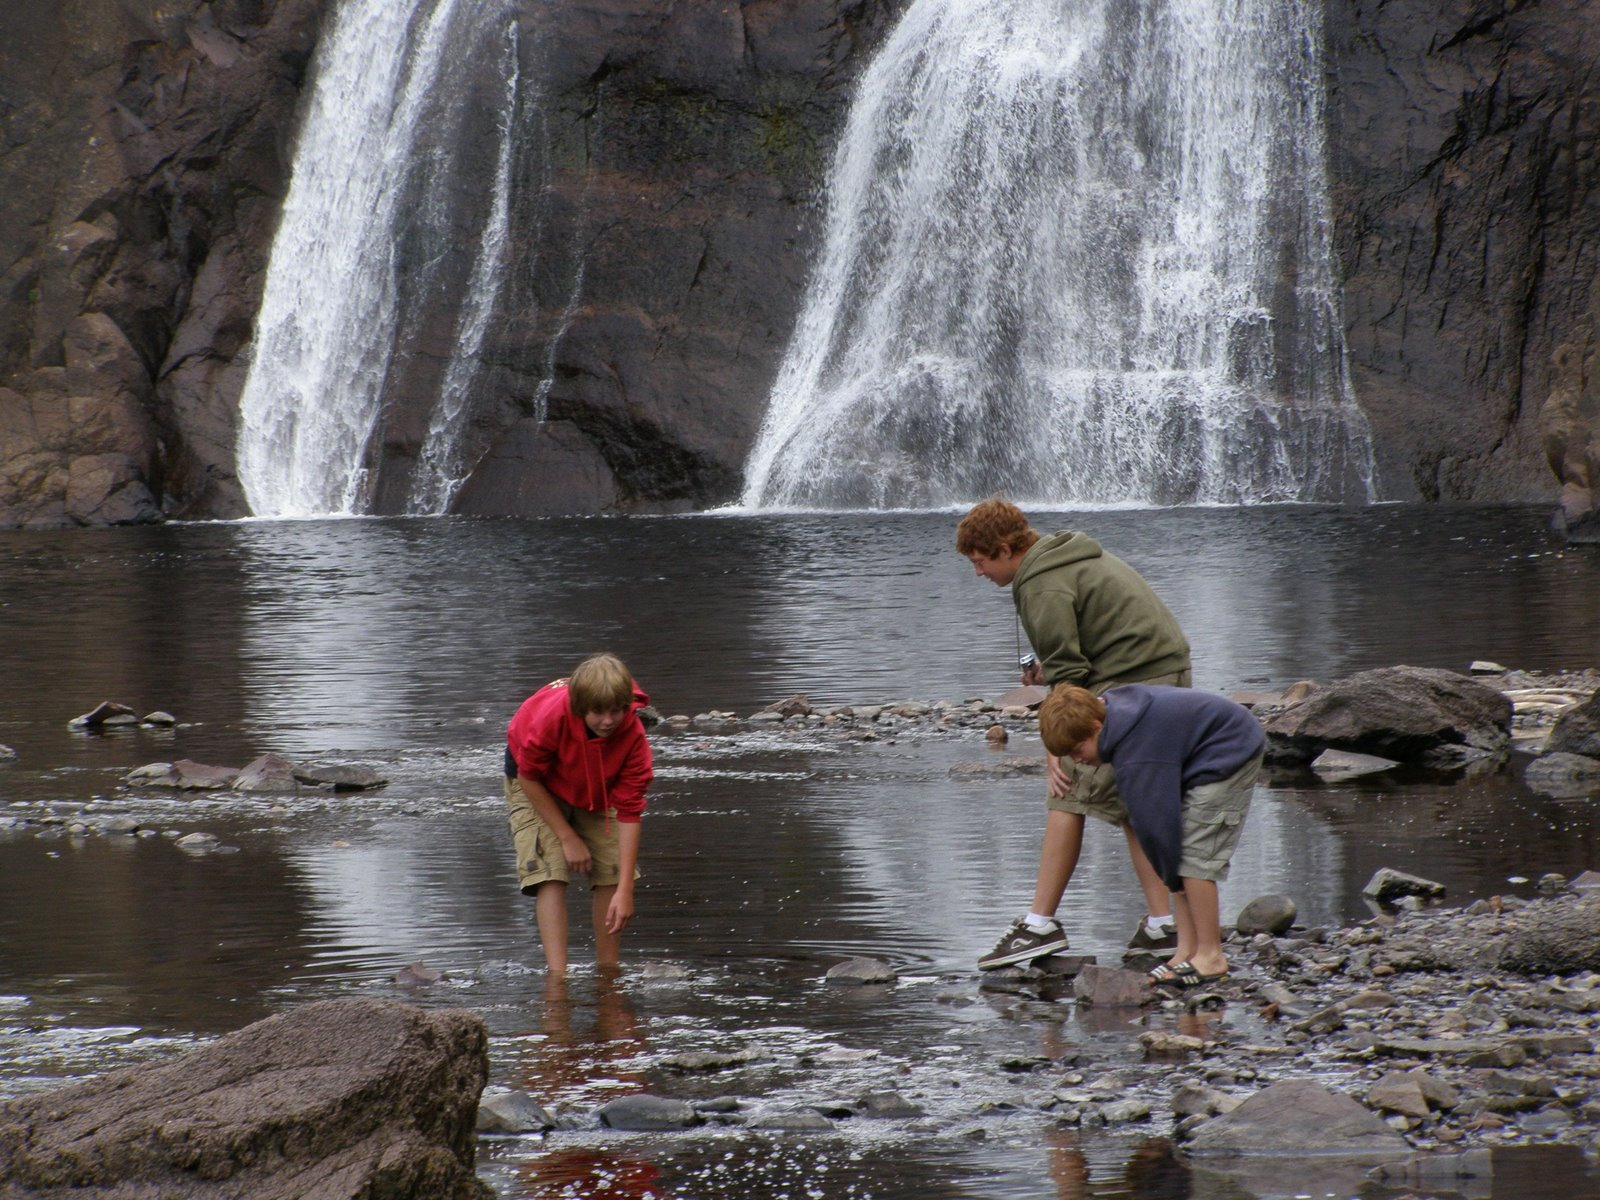 base of high falls, tettegouche state park